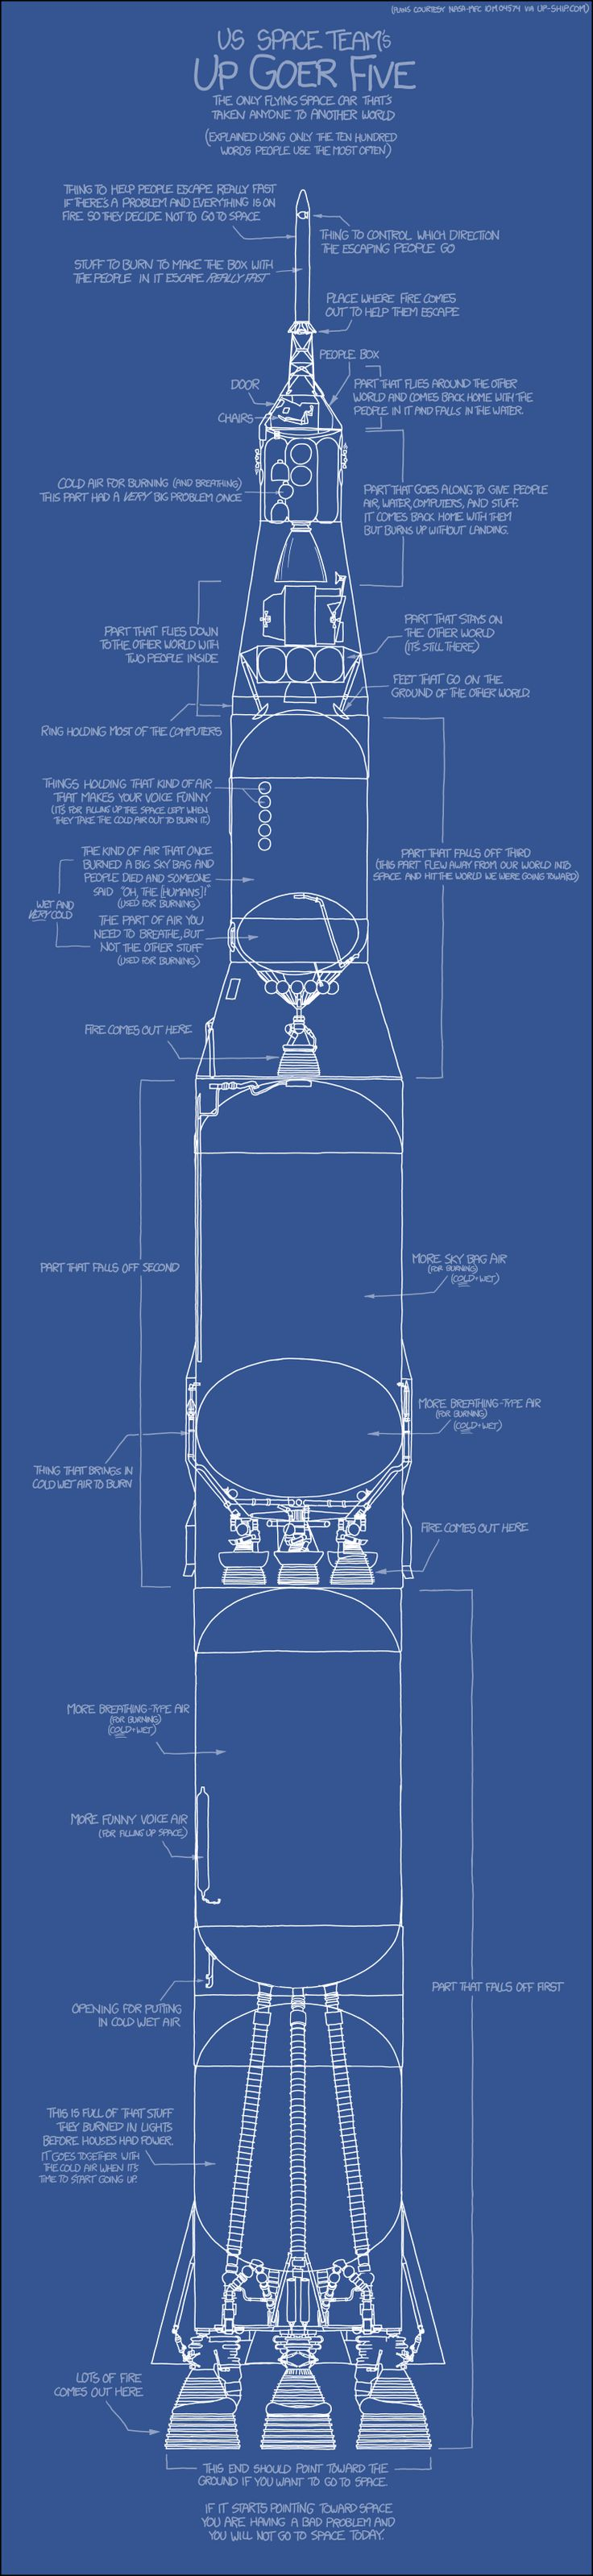 69 Best Apollo Images On Pinterest Missions Space Saturn V F1 Engine Diagram Up Goer Five La Boite Verte